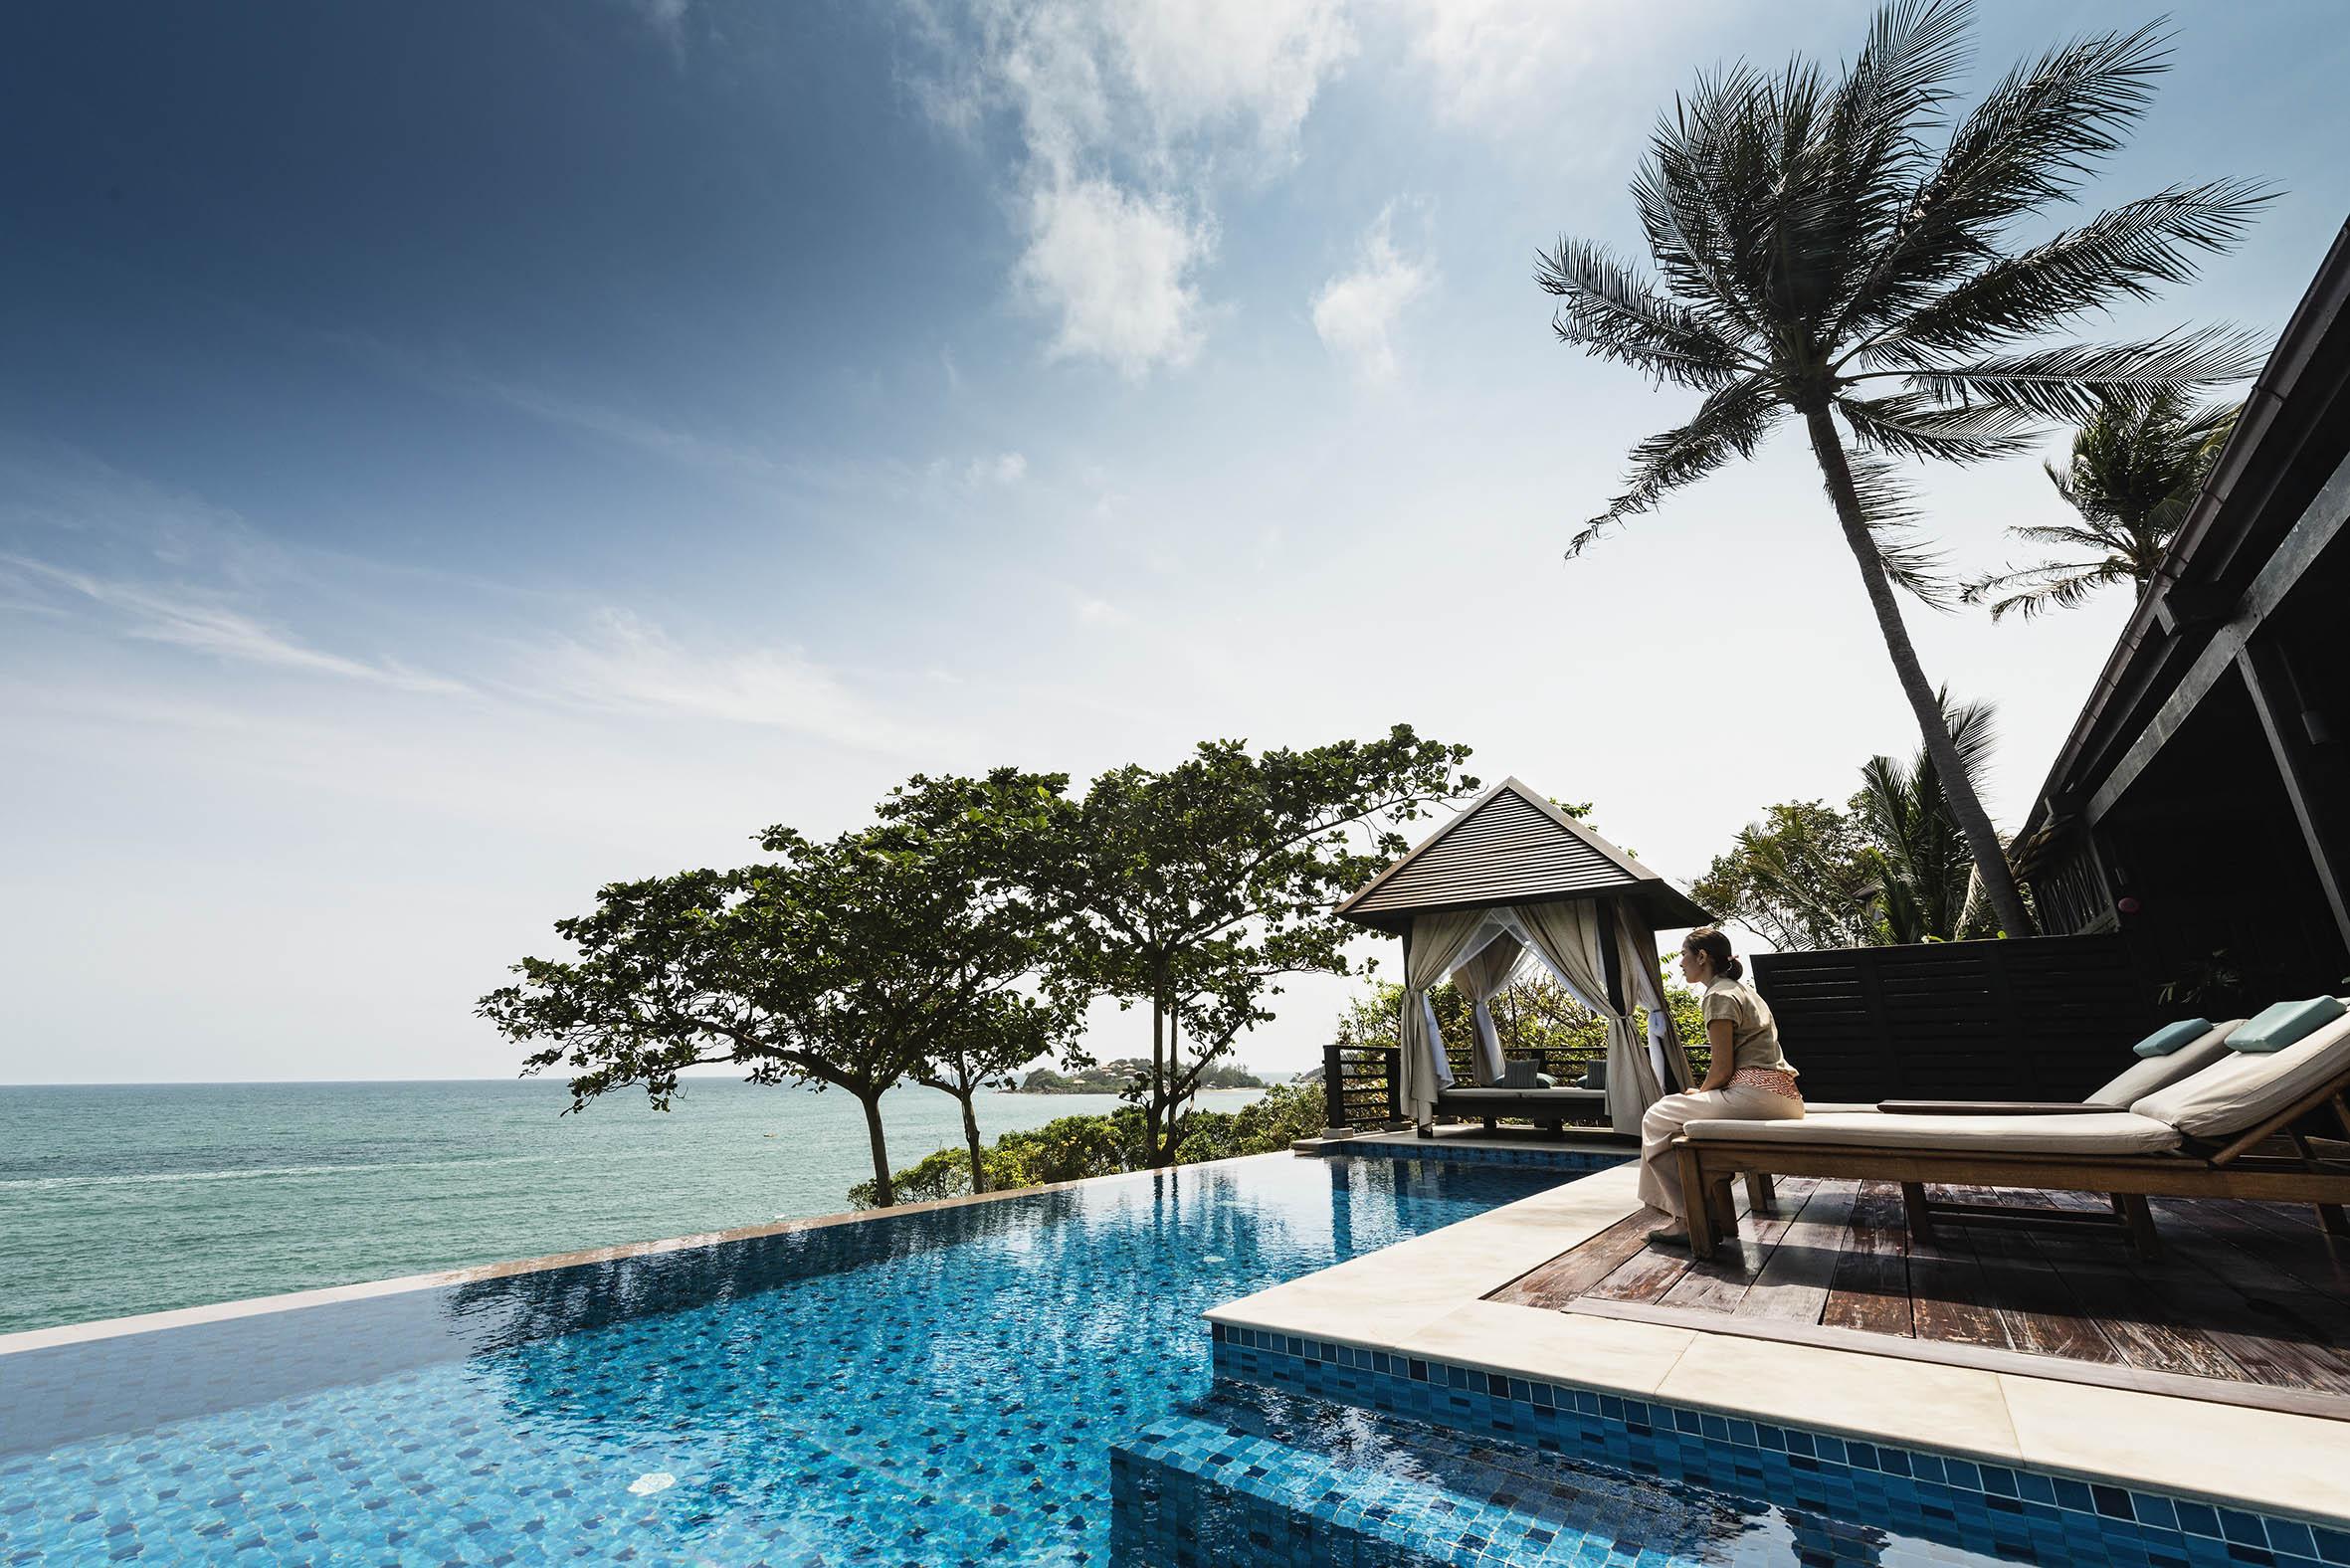 Story: Thailand - Go Green